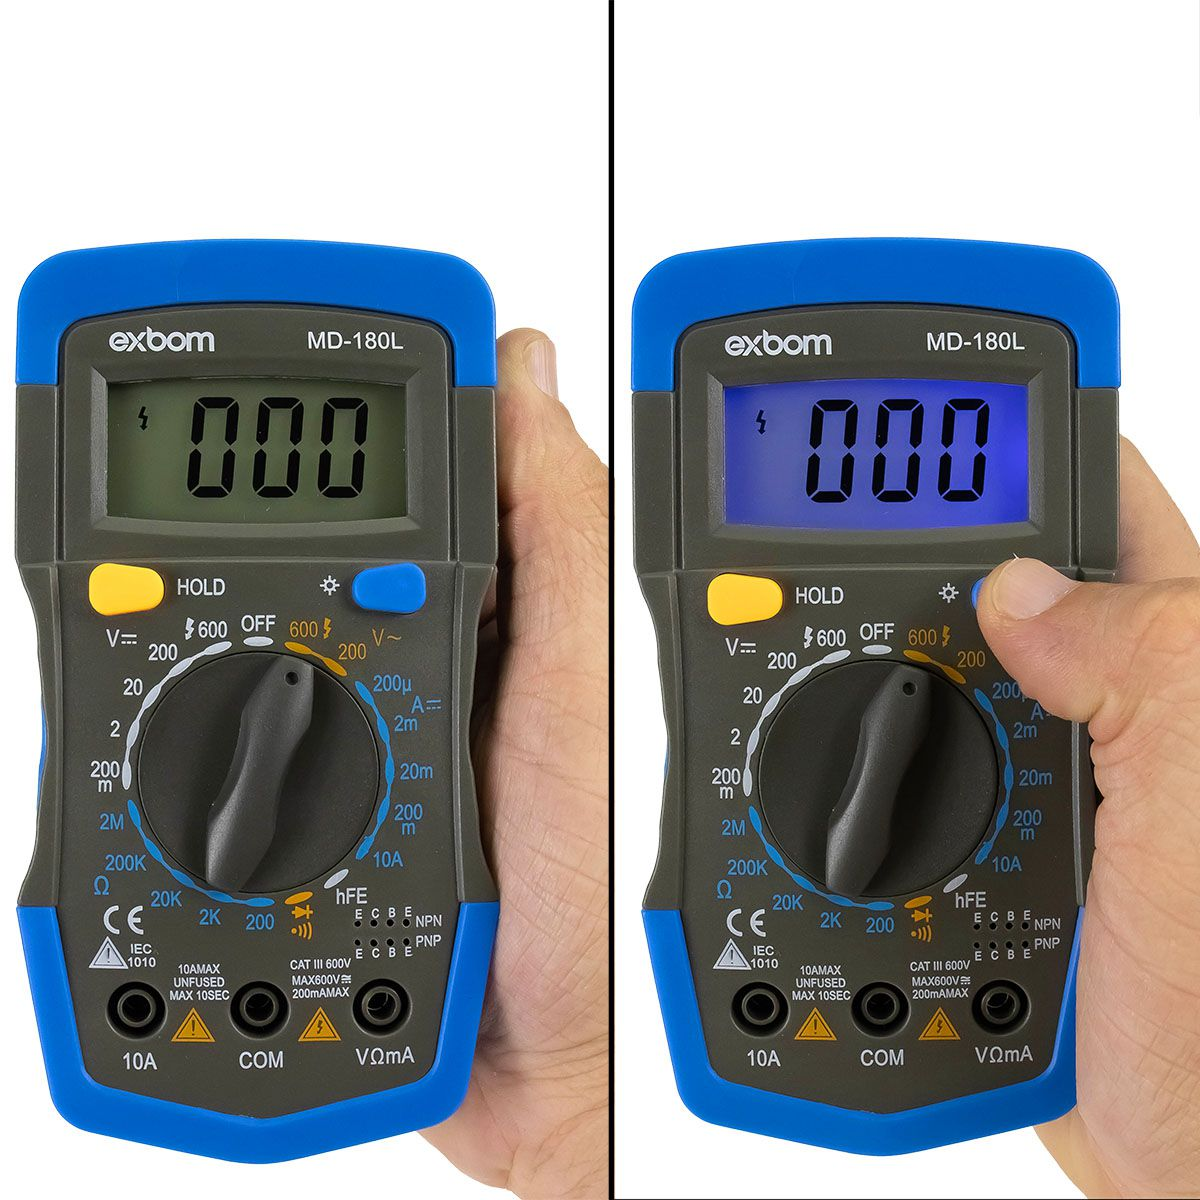 Multímetro Digital Exbom MD-180L Portátil Display 3 1/2 Iluminado com Beep Sonoro